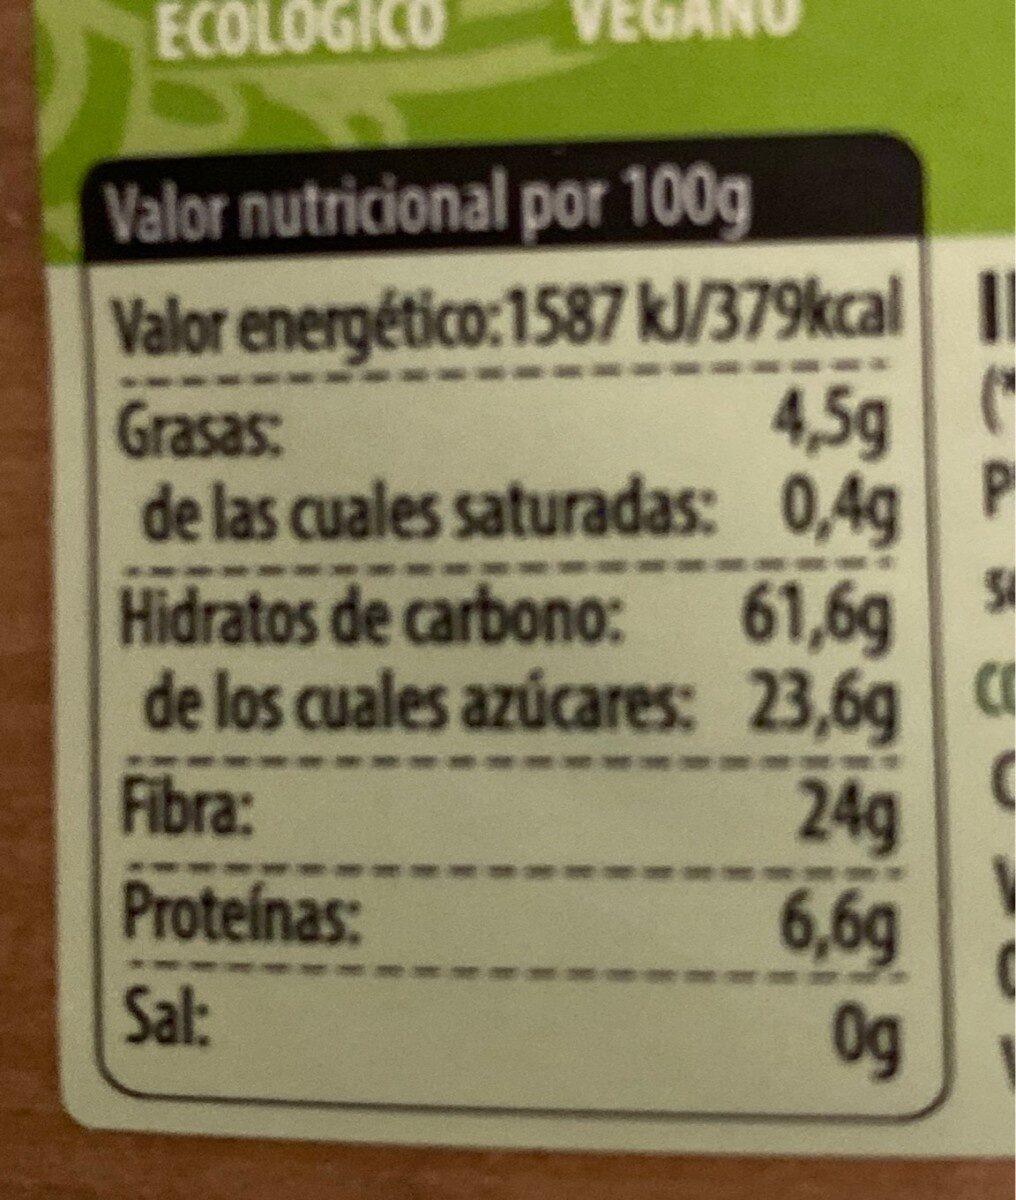 Matcha en polvo - Nutrition facts